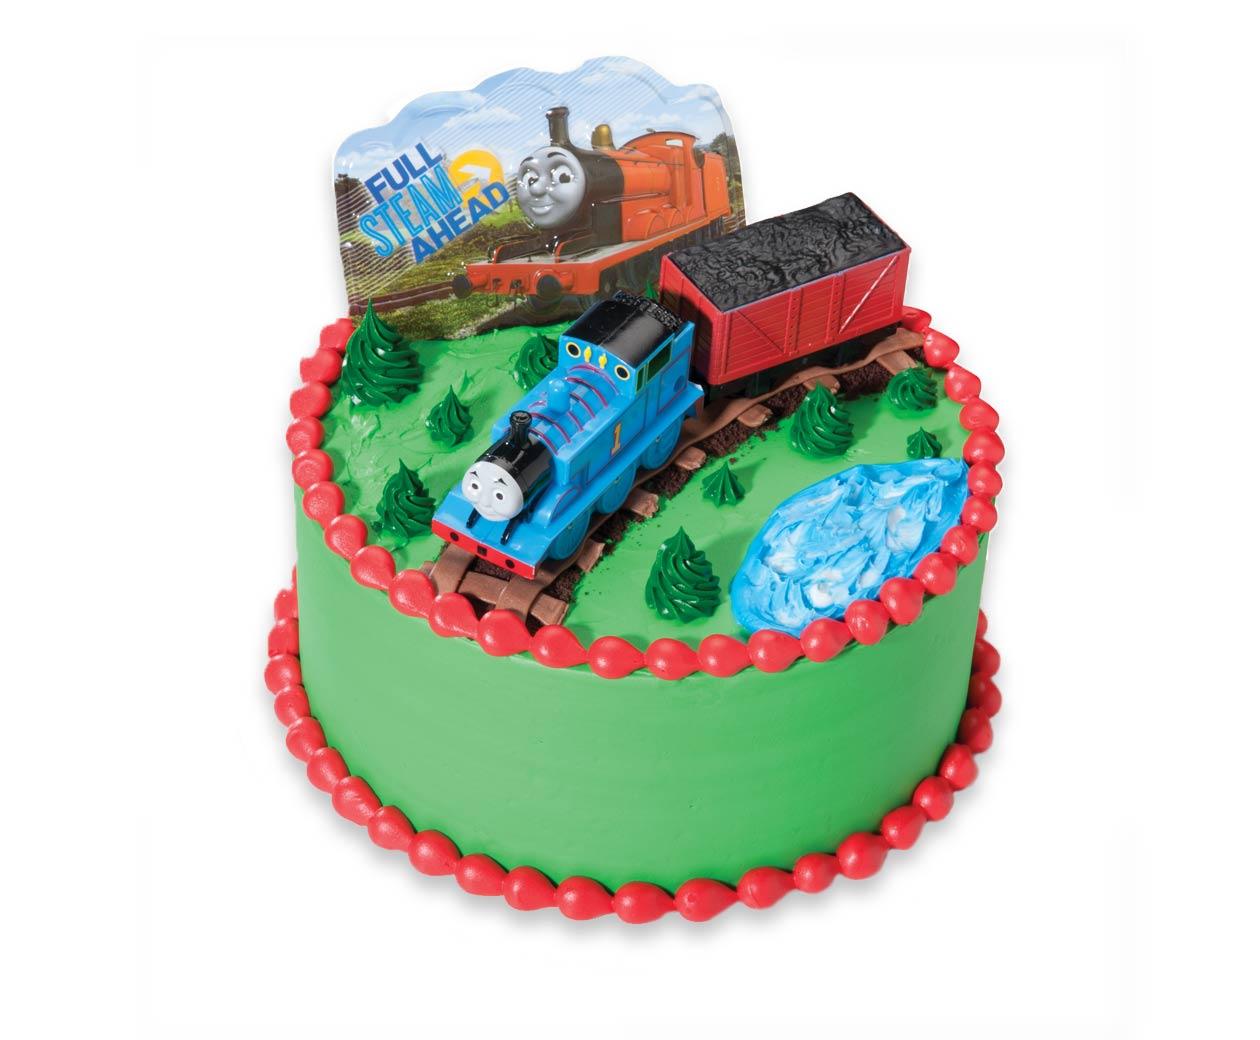 Thomas The Train Ice Cream Cake